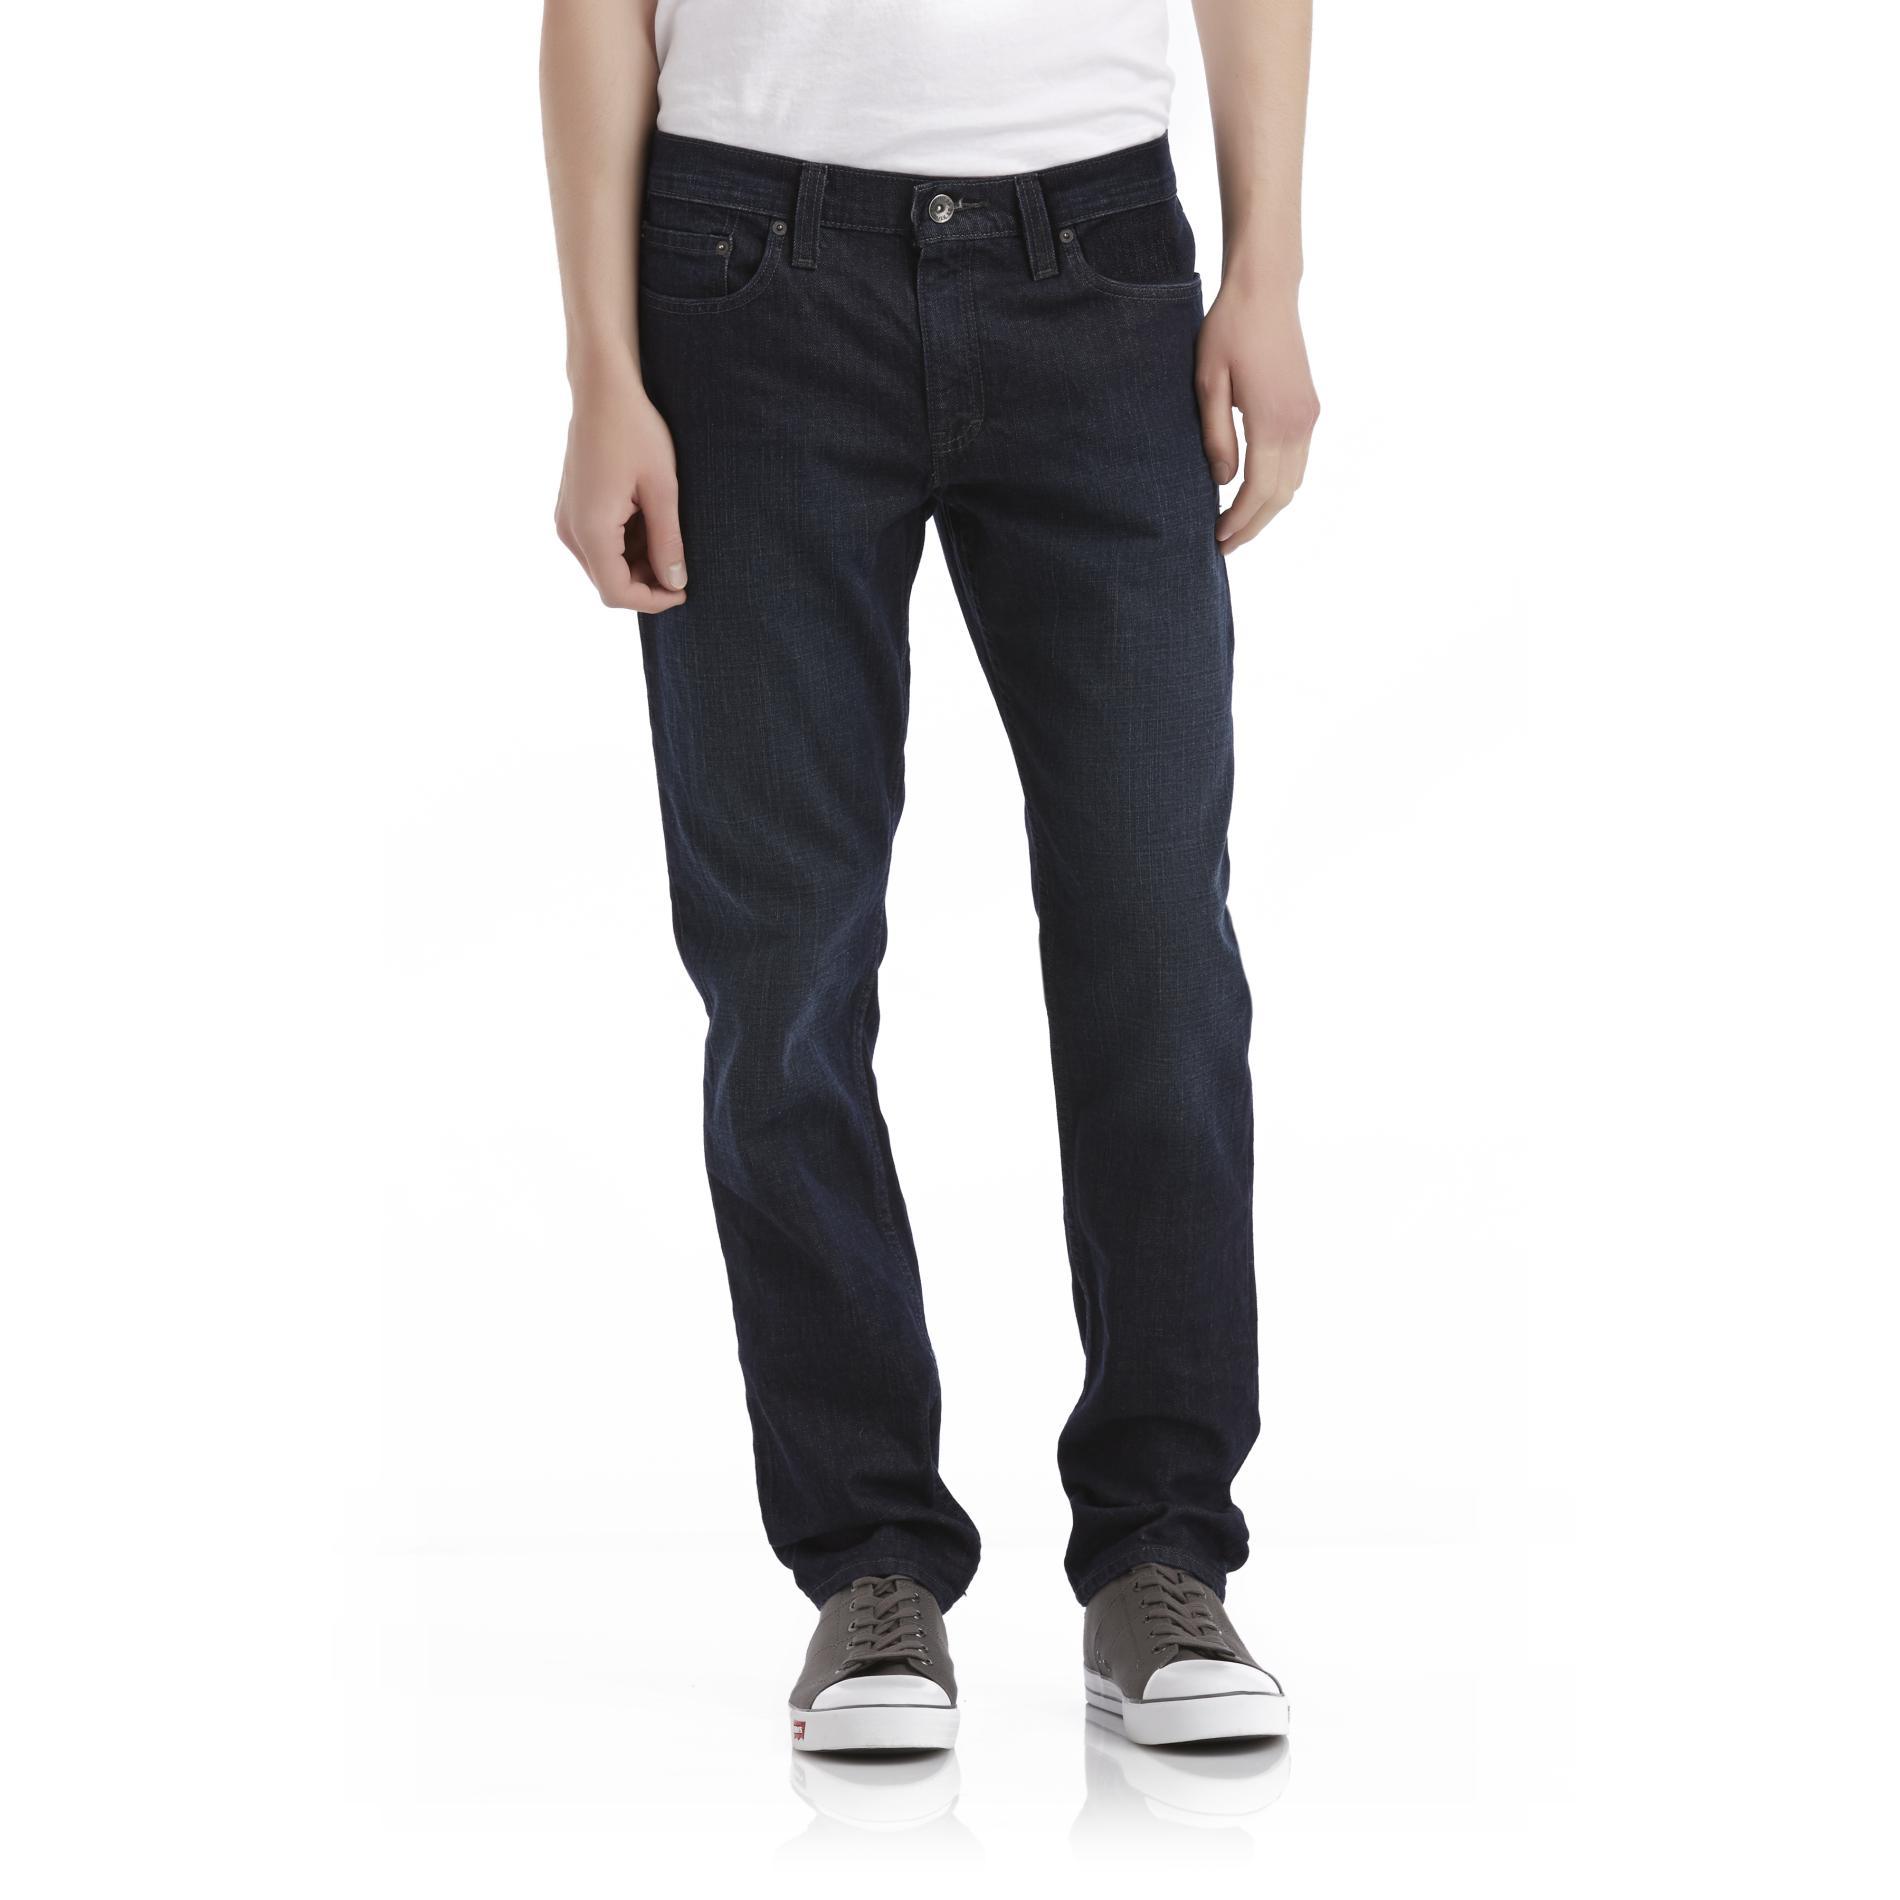 Route 66 Men's Skinny Jeans